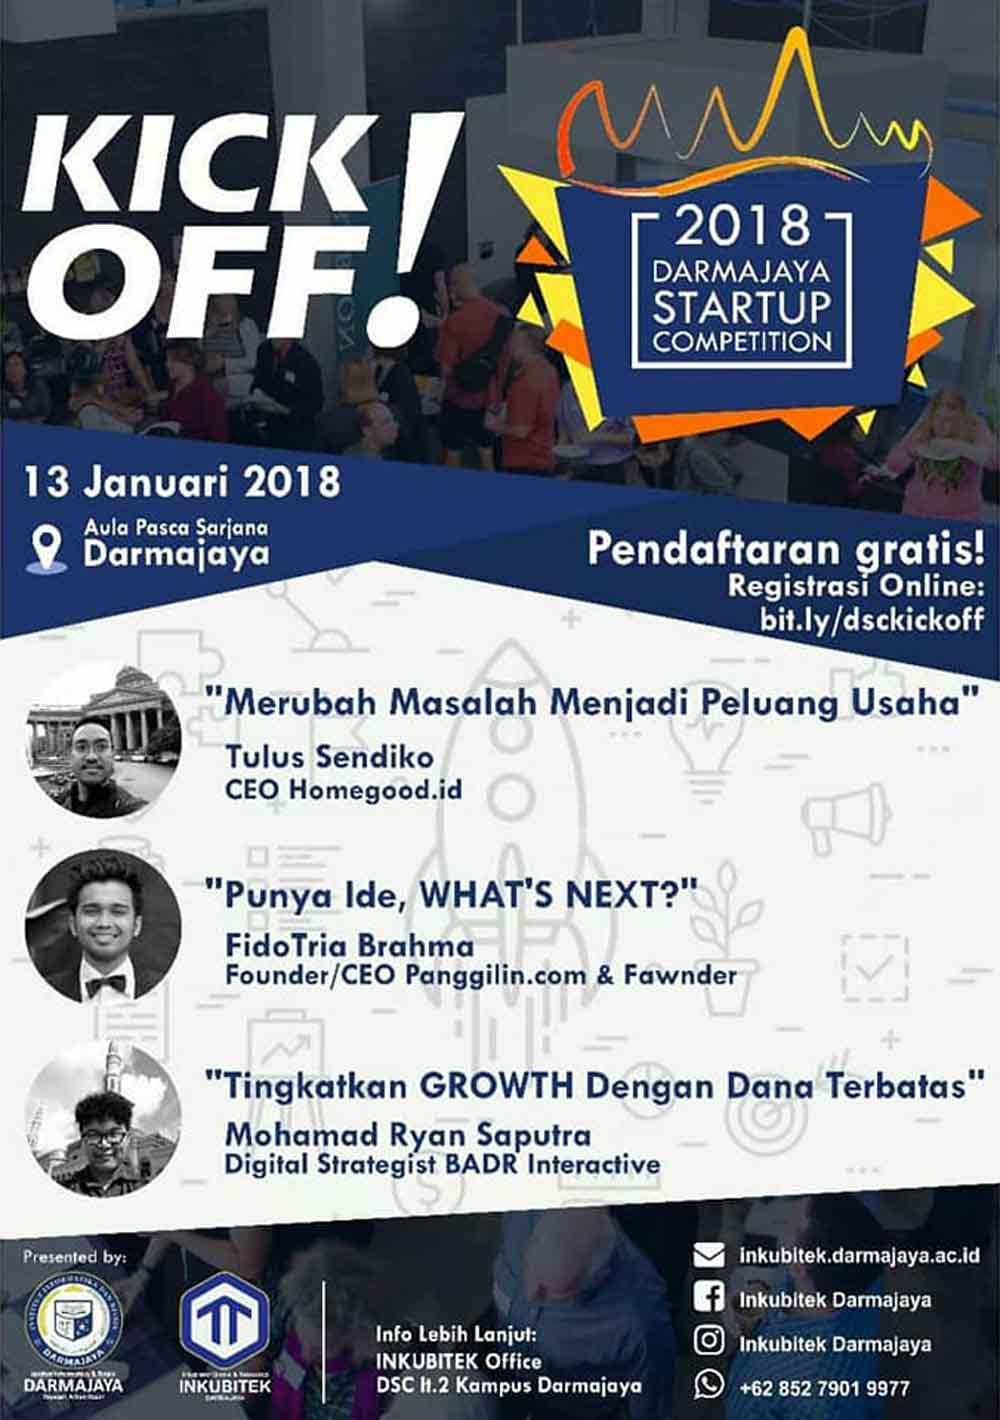 Kick Off Darmajaya Startup Competition 2018